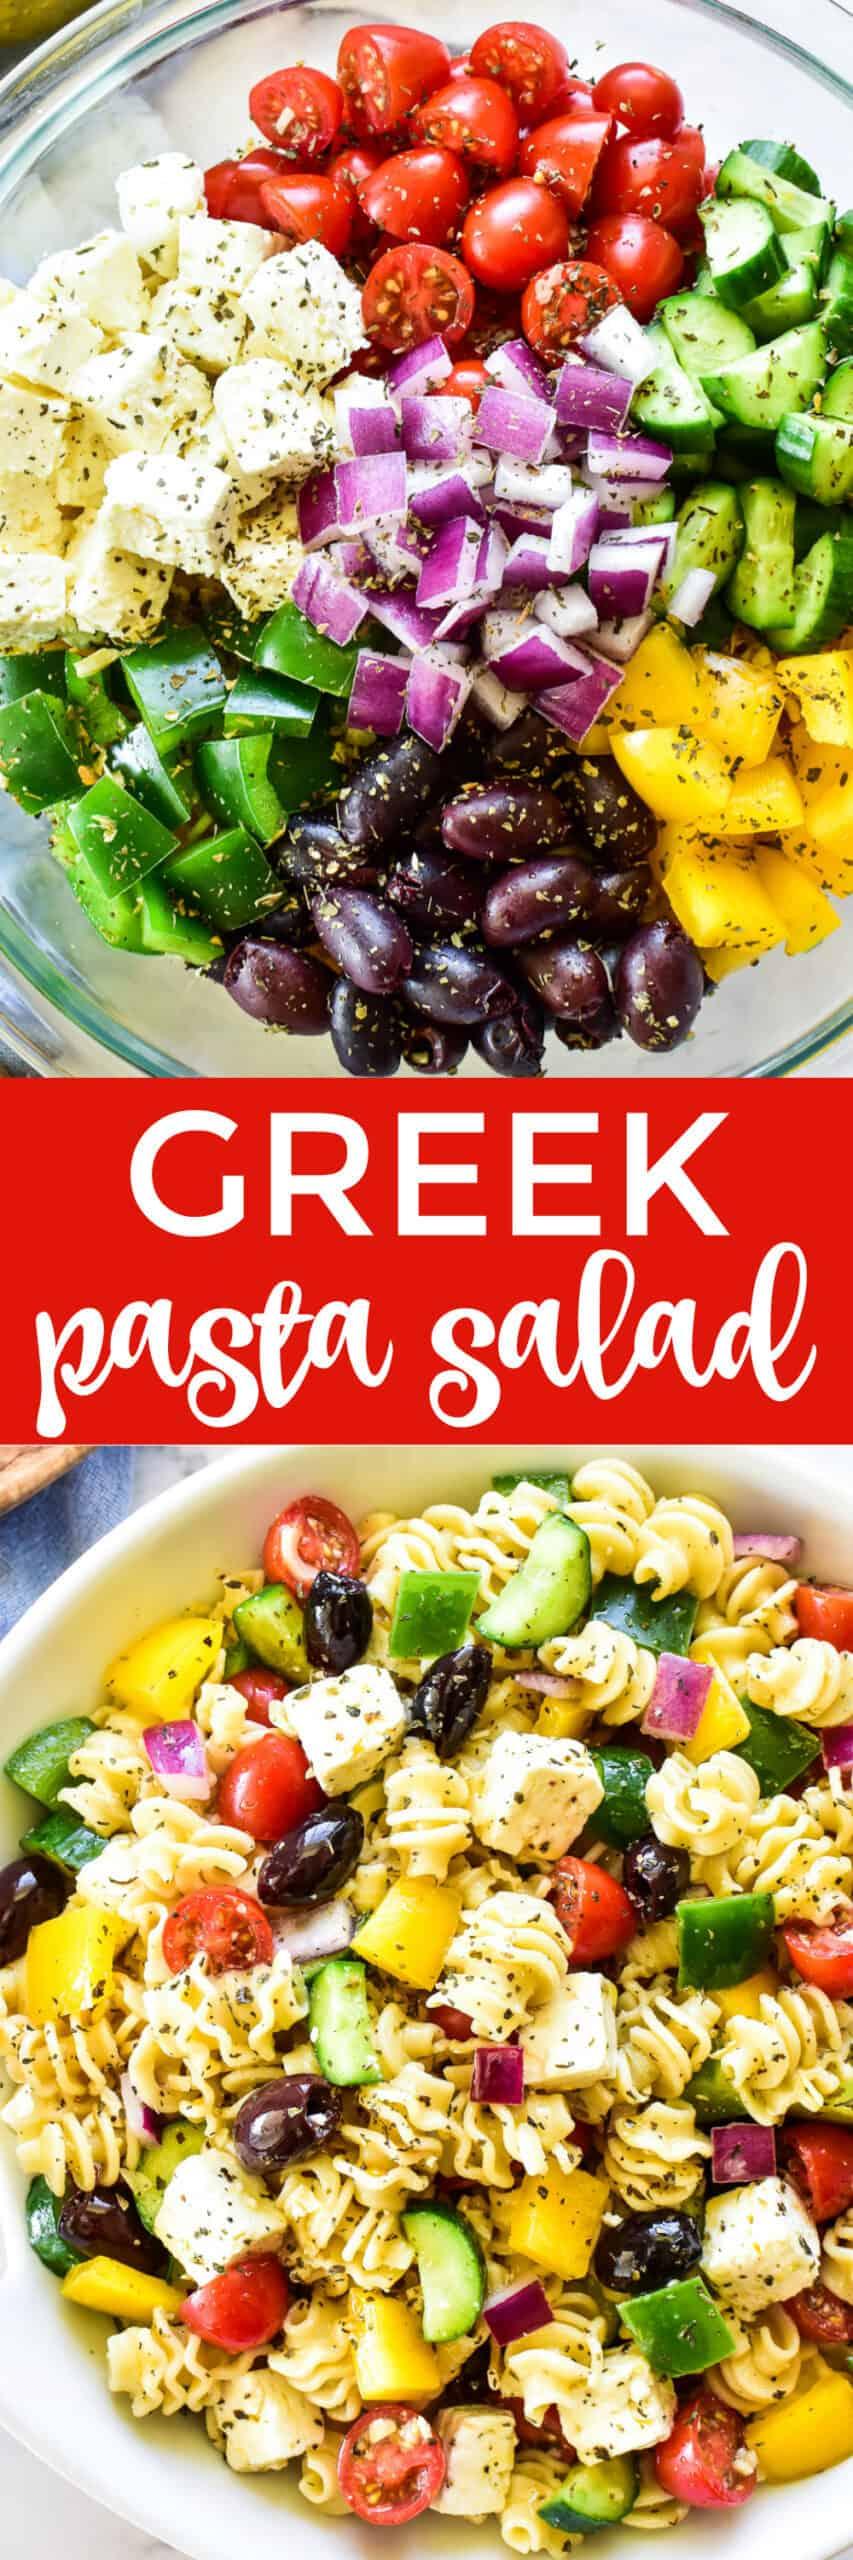 Collage image of Greek pasta Salad